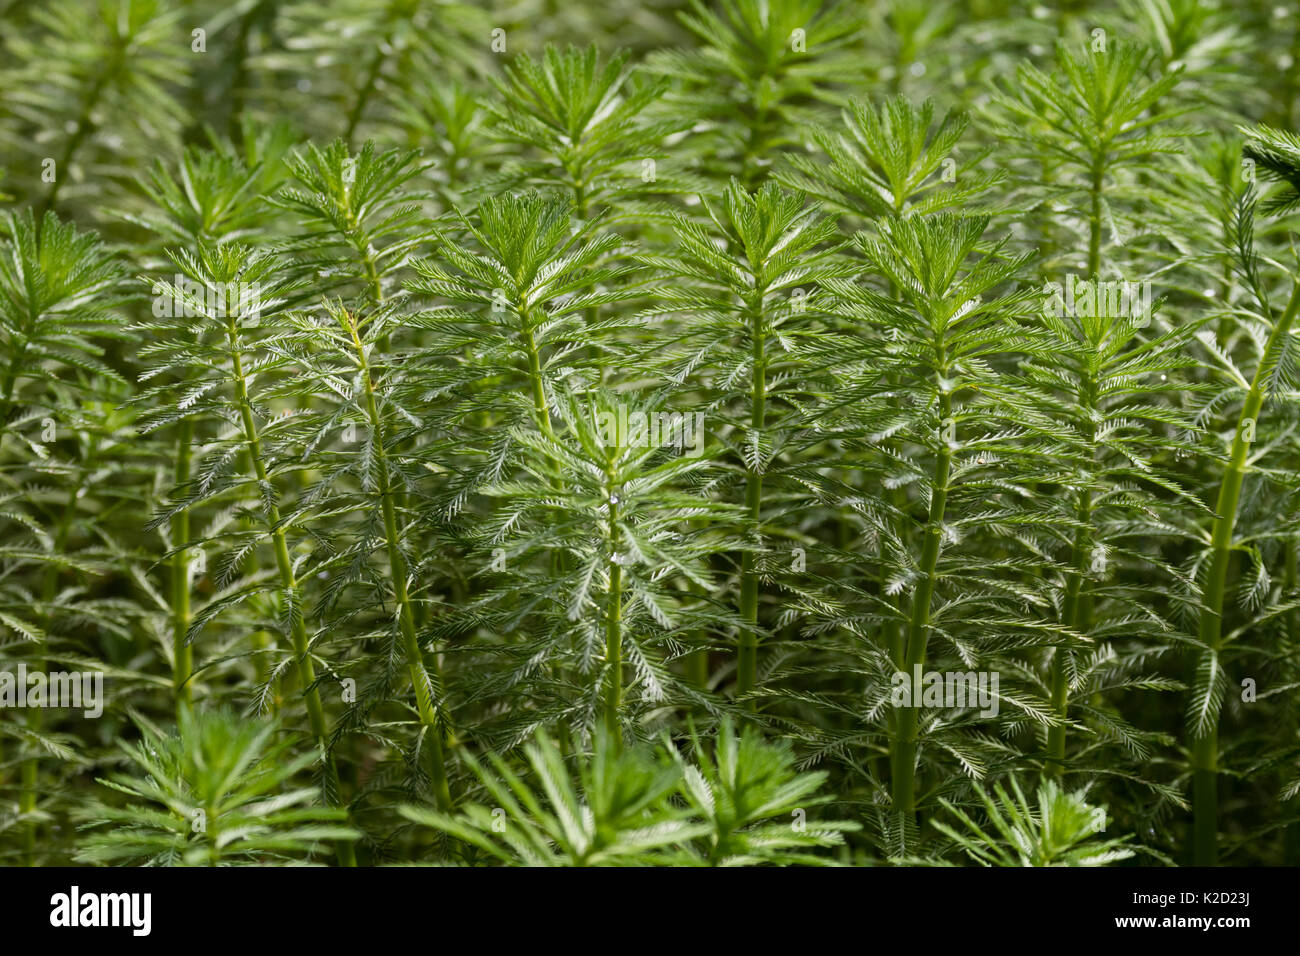 Emergent stems of the invasive aquatic weed, Myriophyllum aquaticum, Parrot's feather - Stock Image